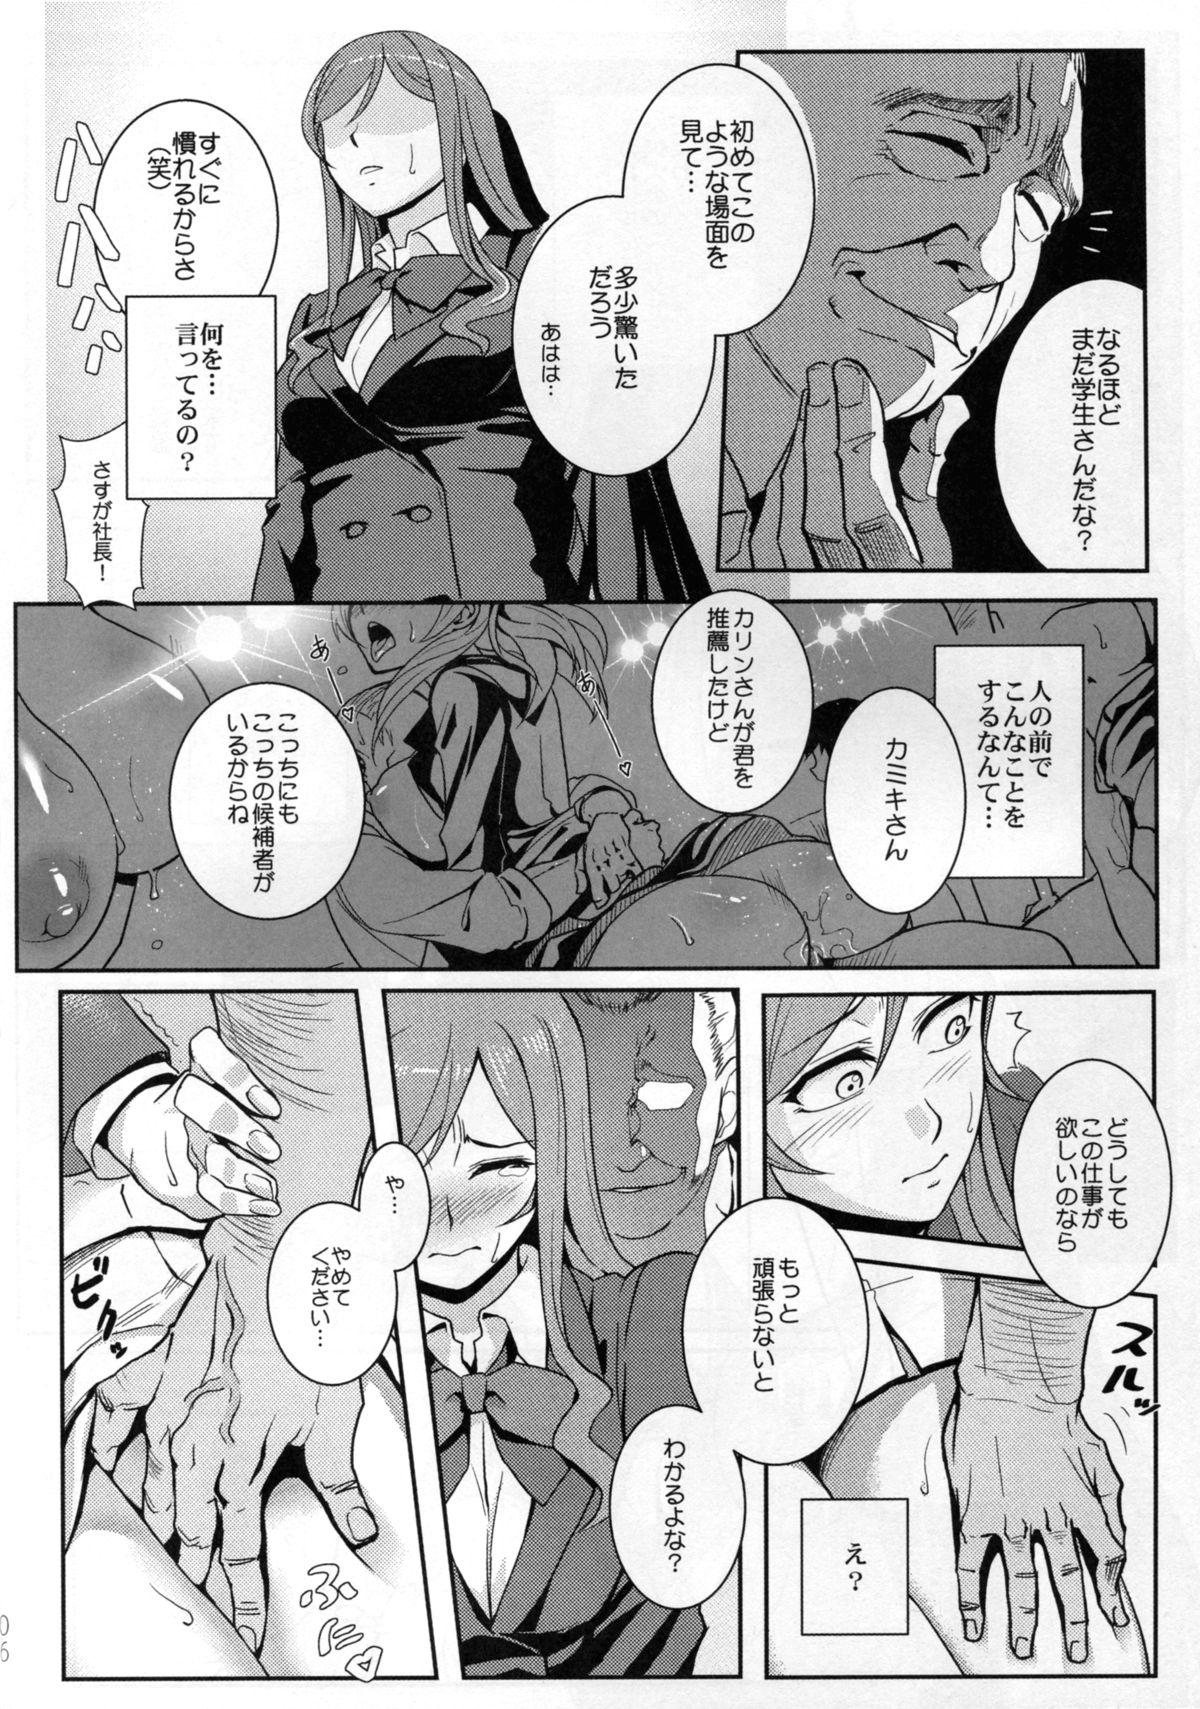 Gunpla Battle Image Character TRY!!! 7